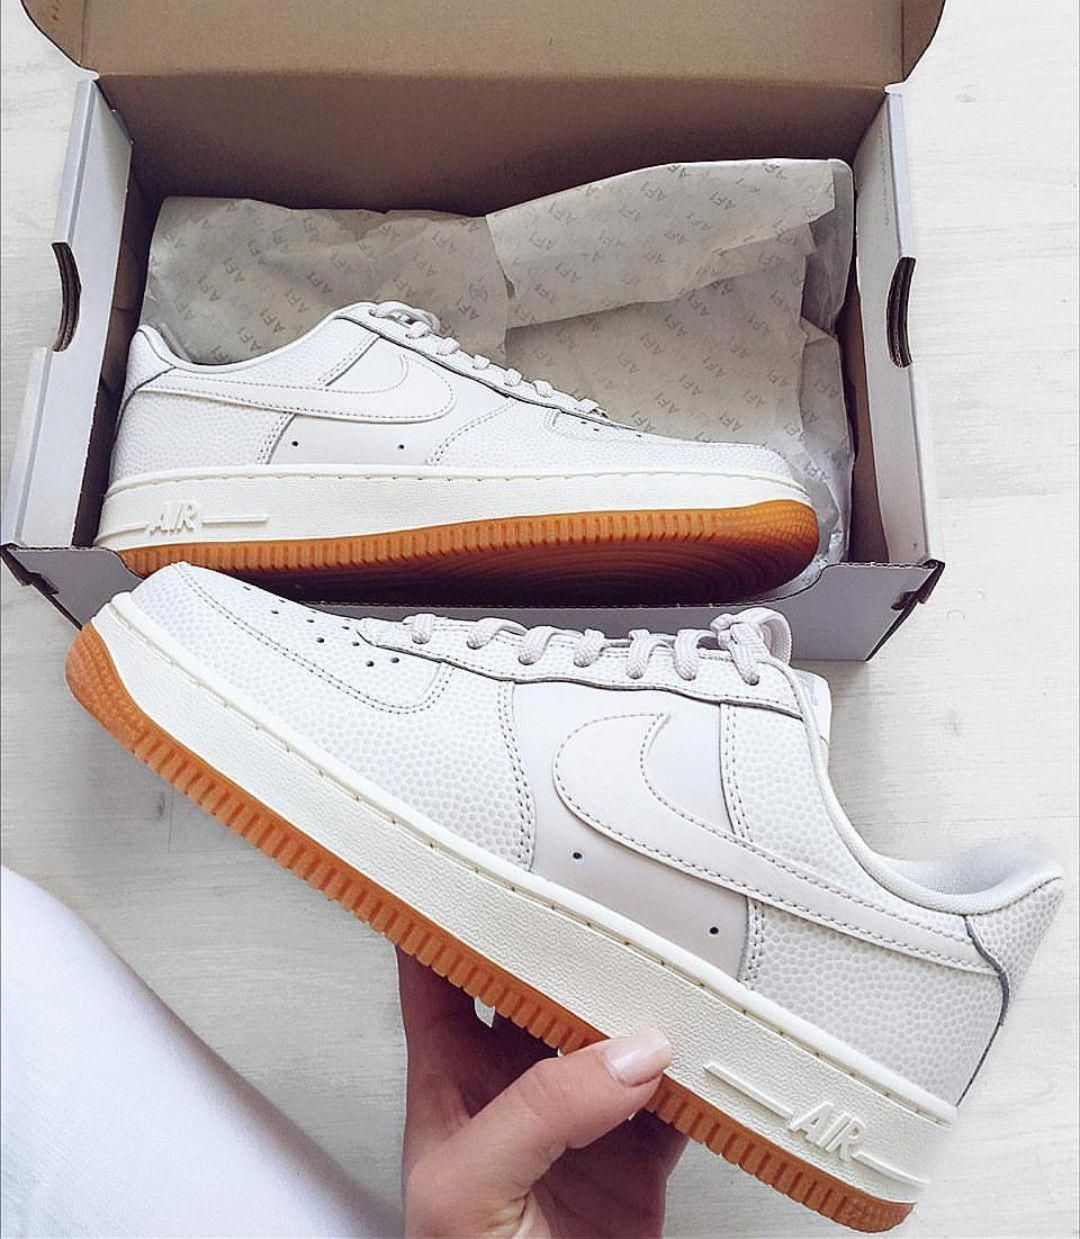 Nike Air Force 1 in whiteweiß Foto: dilekca_ |Instagram